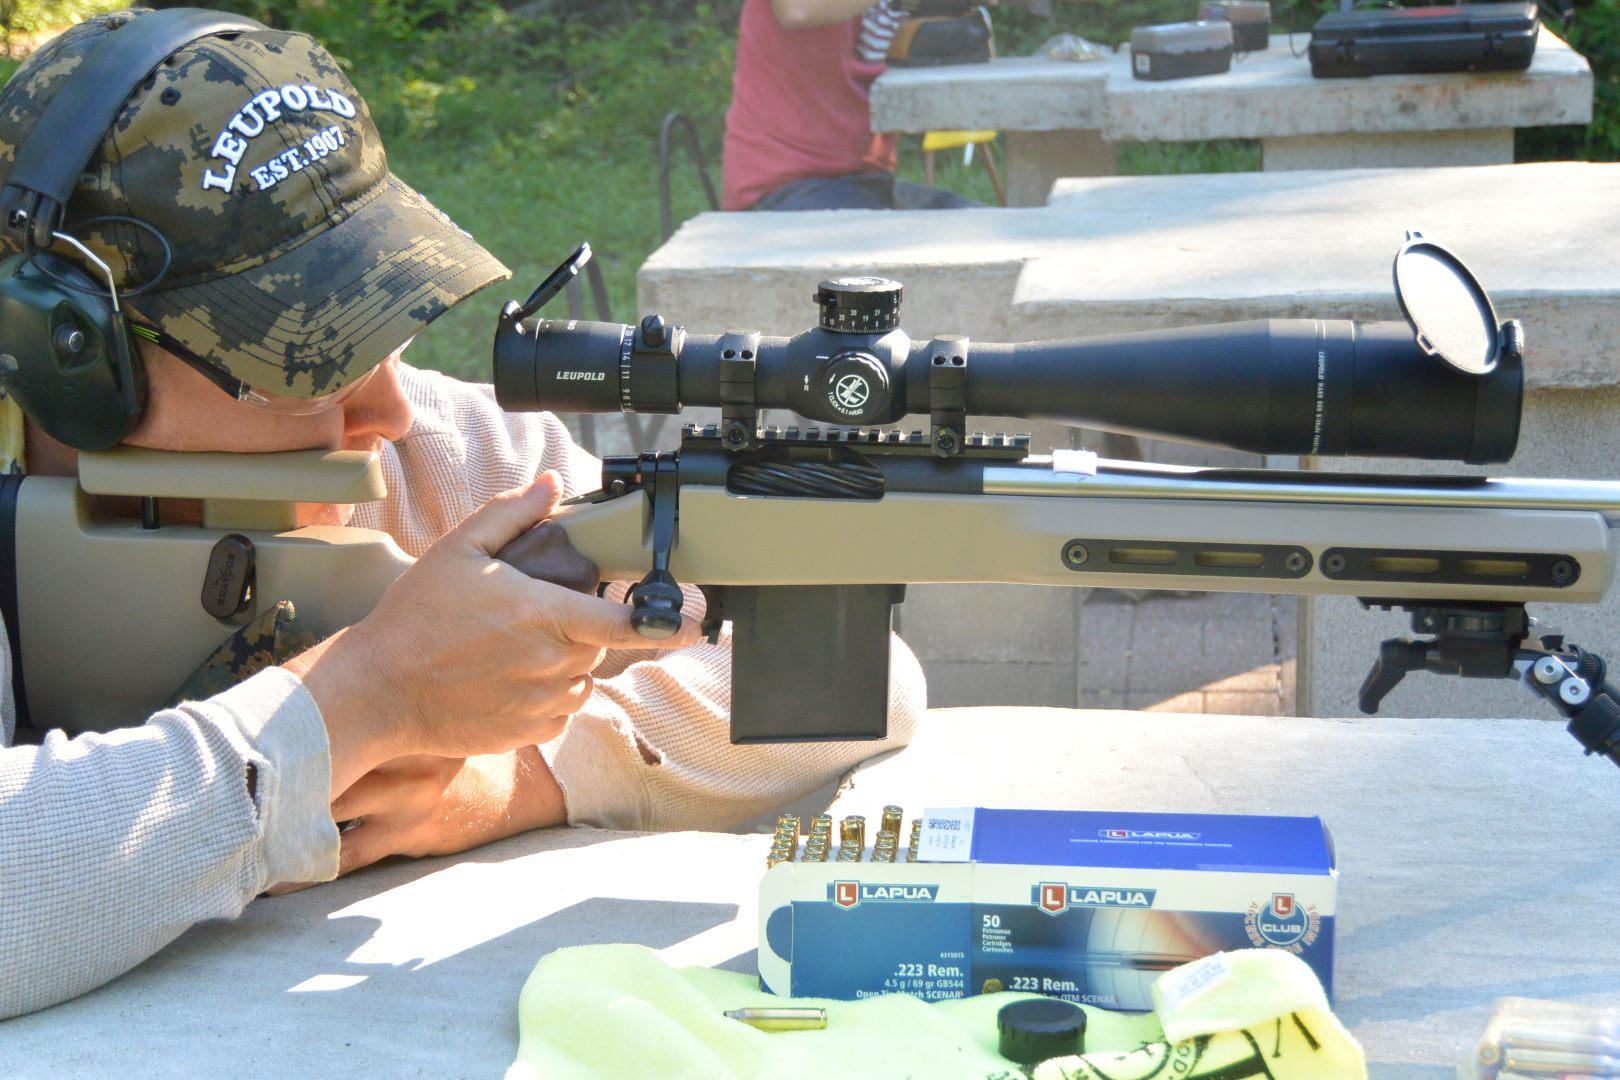 https://u.cubeupload.com/BigJimFish/2021711mark5kelblyla.jpg Competition day with the Leupold Mark 5HD 5-25x56 on the Kelbly's Atlas Tactical rifle in a Grayboe Ridgeback stock with Lapua factory ammo